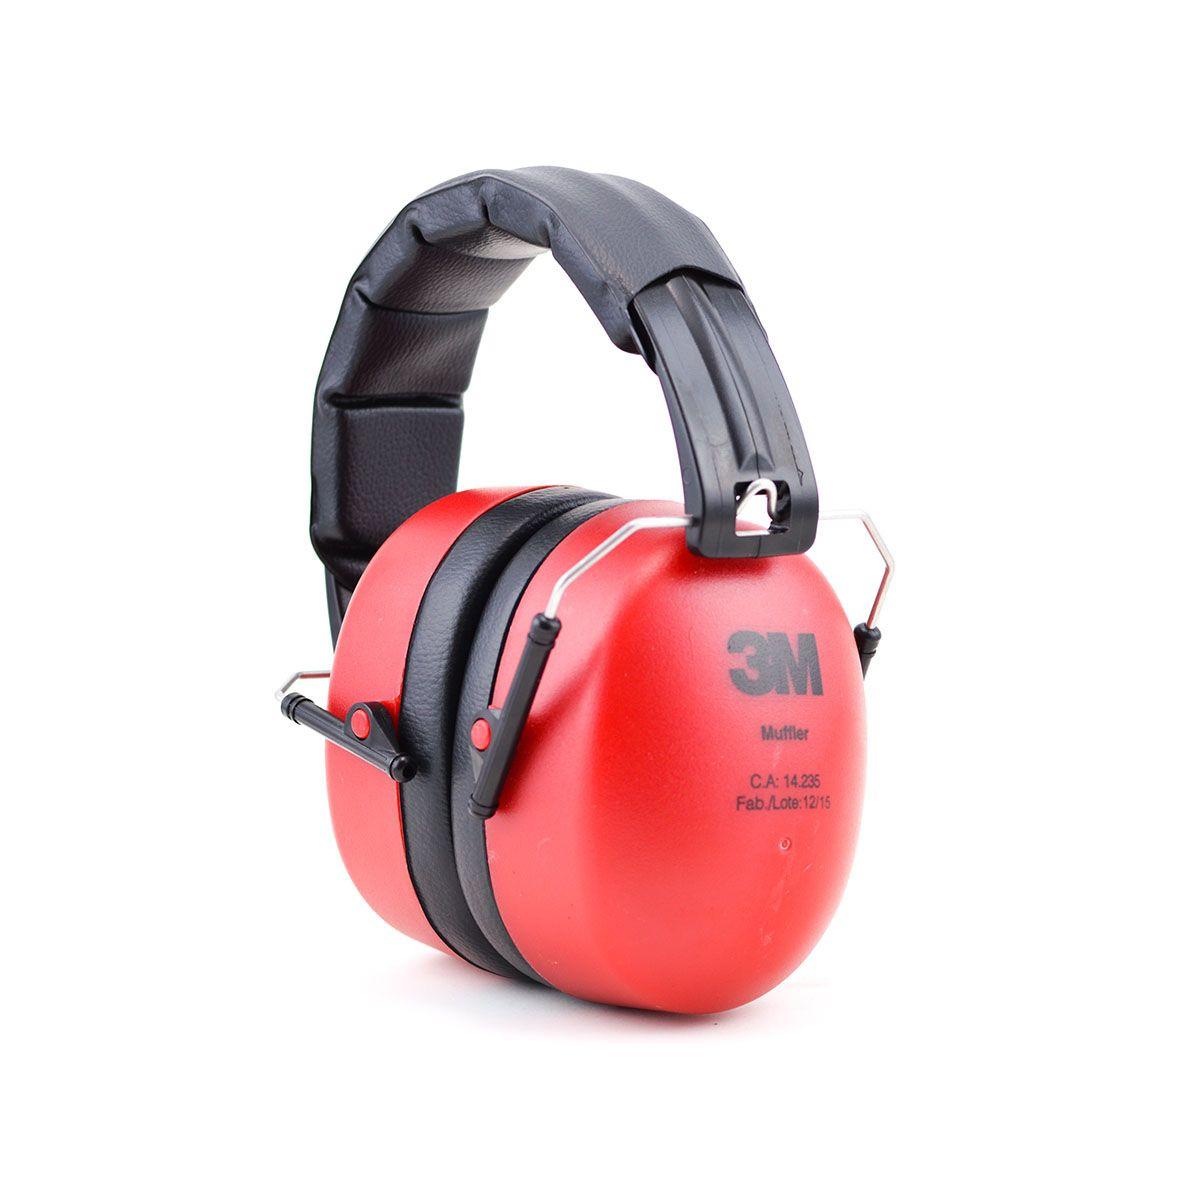 Protetor Auricular 3M Muffler Tipo Concha 21db CA 14235 HB004363592